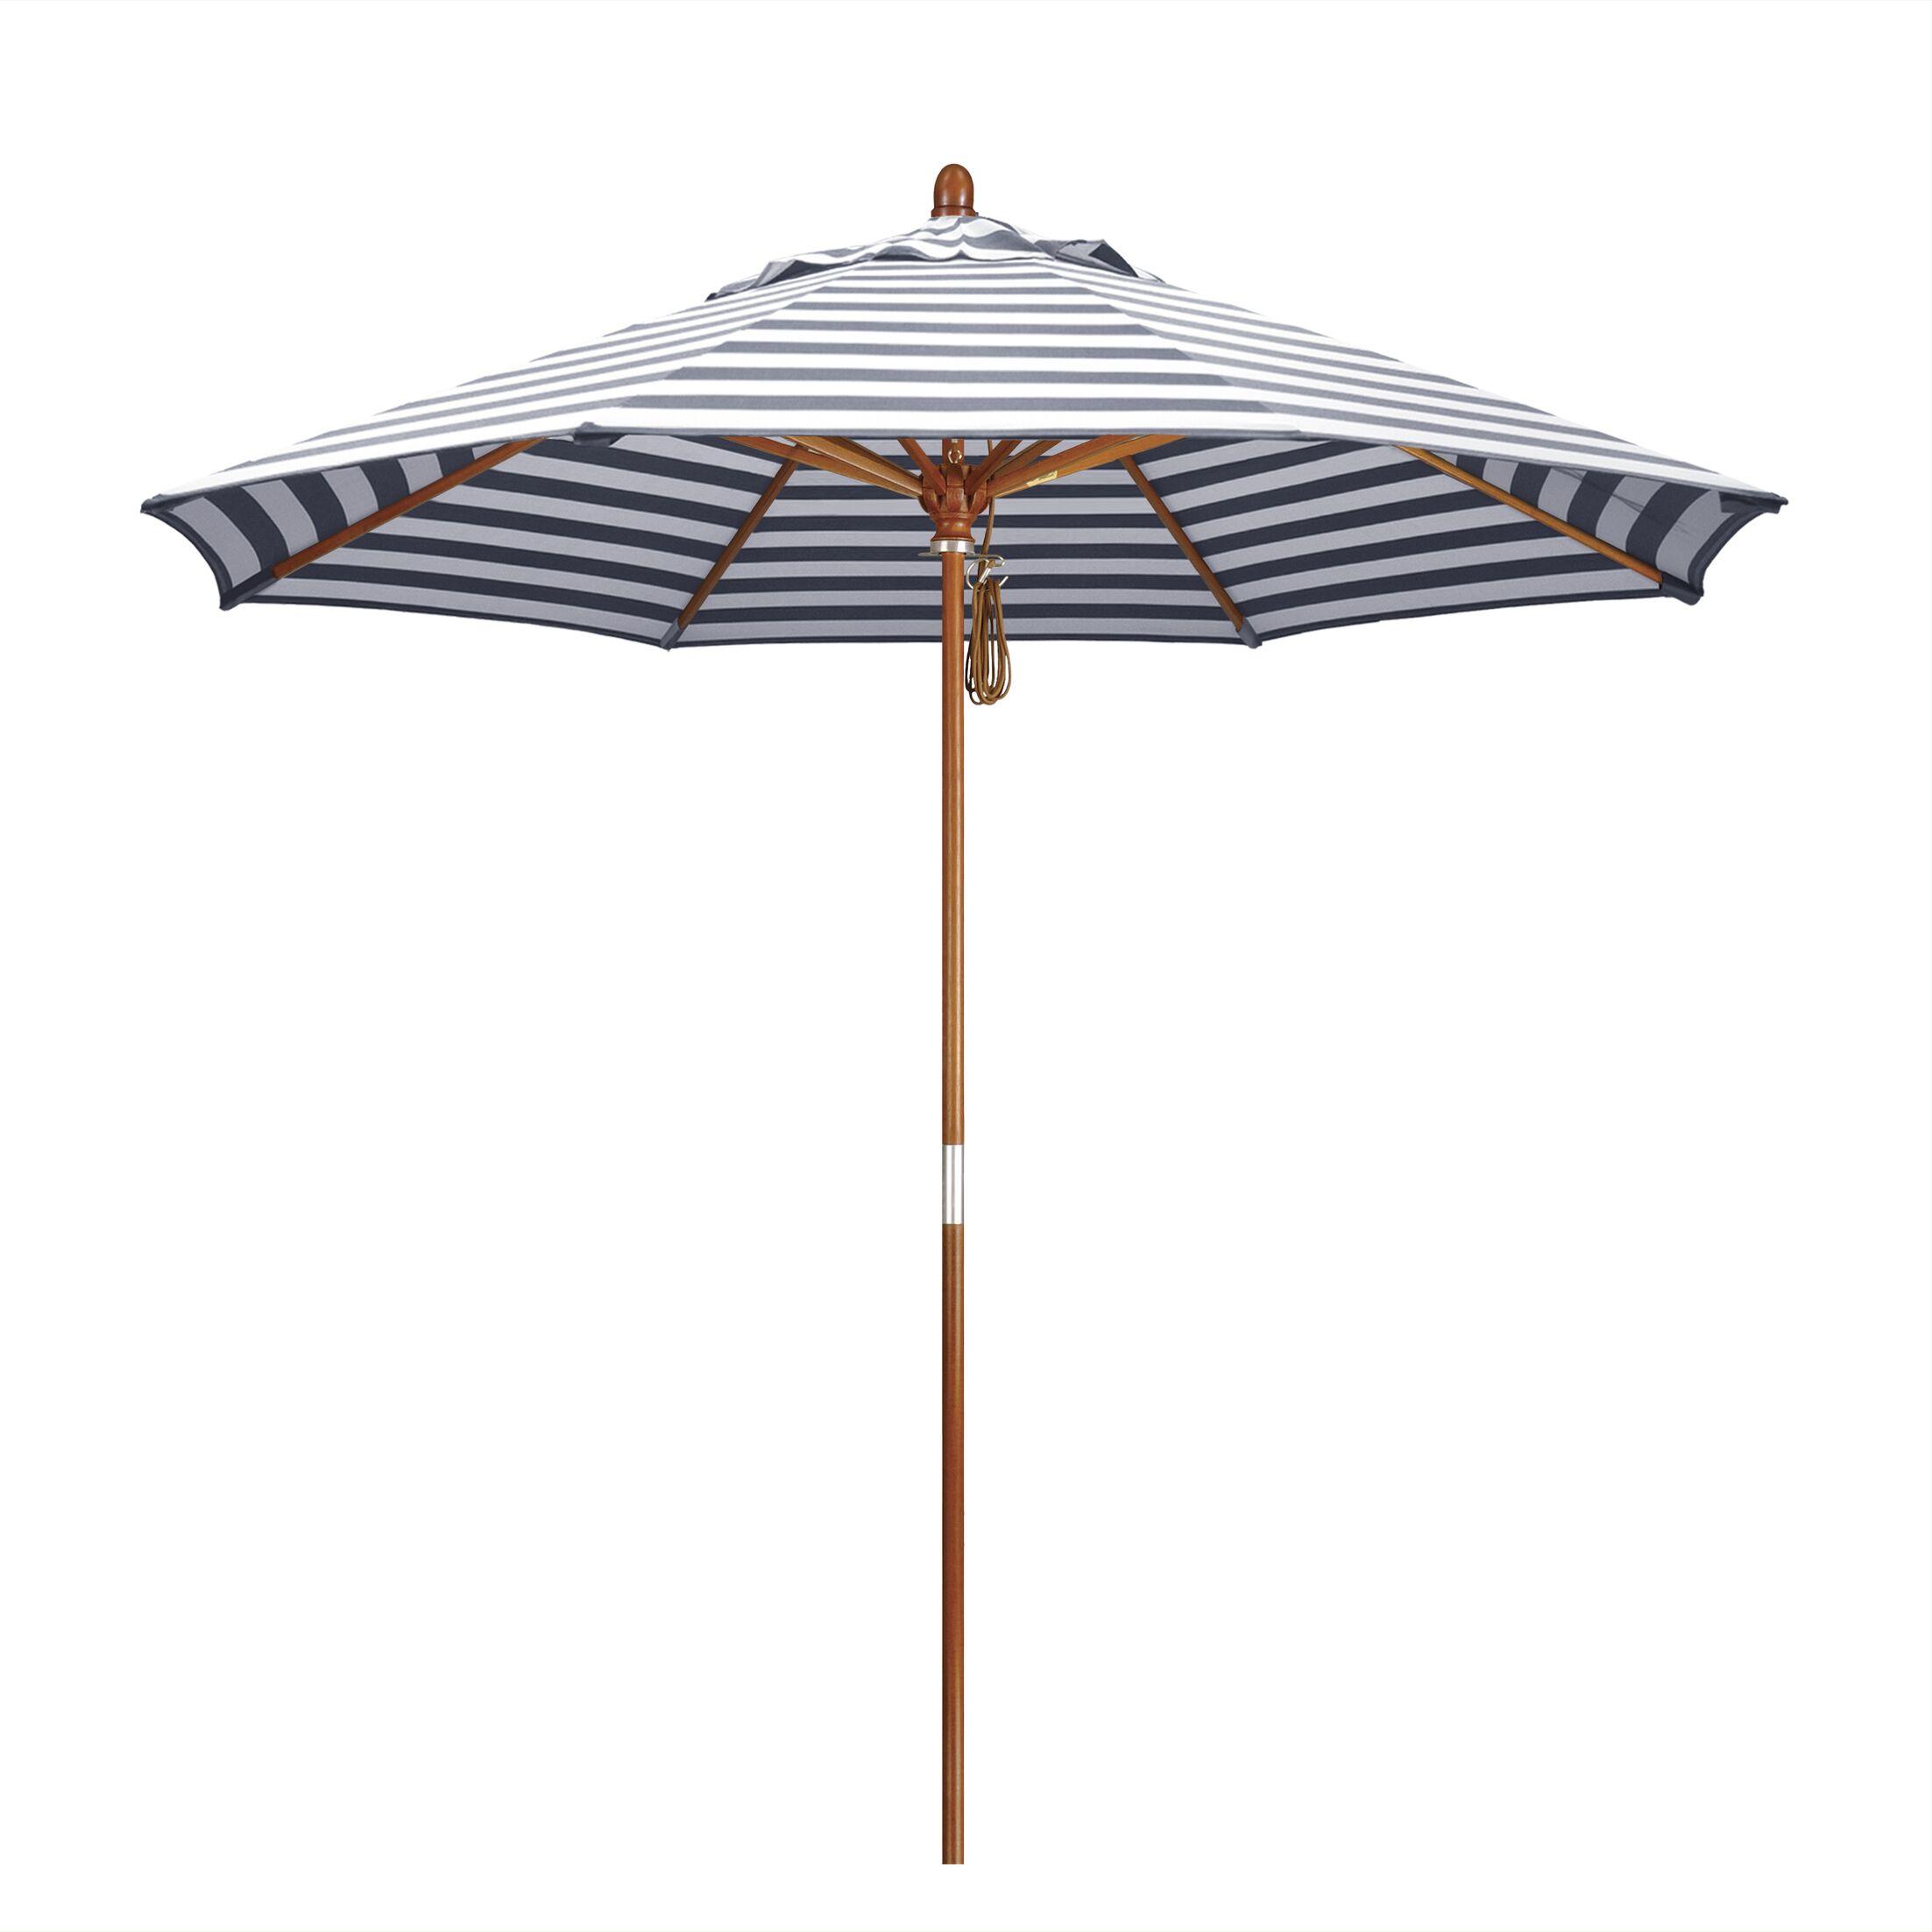 Mare 9' Market Umbrella Fabric Color: Olefin - Navy White Cabana Stripe